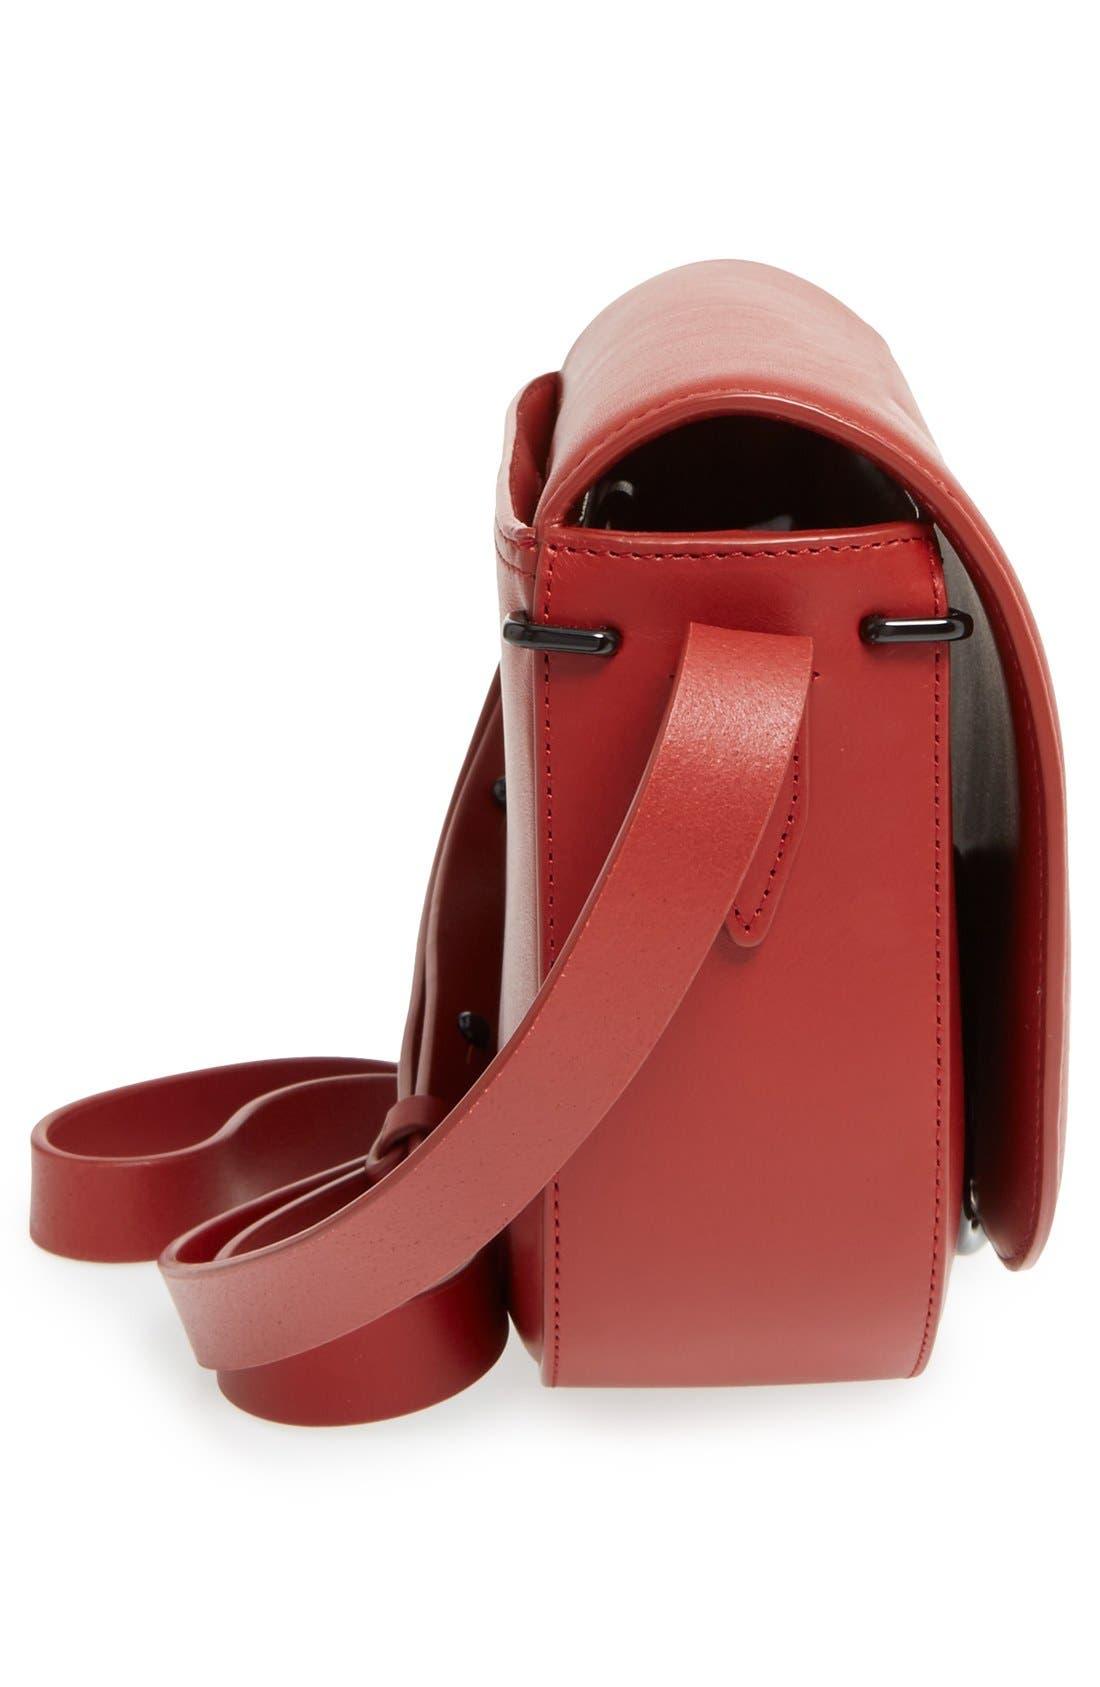 Alix Leather Saddle Bag,                             Alternate thumbnail 15, color,